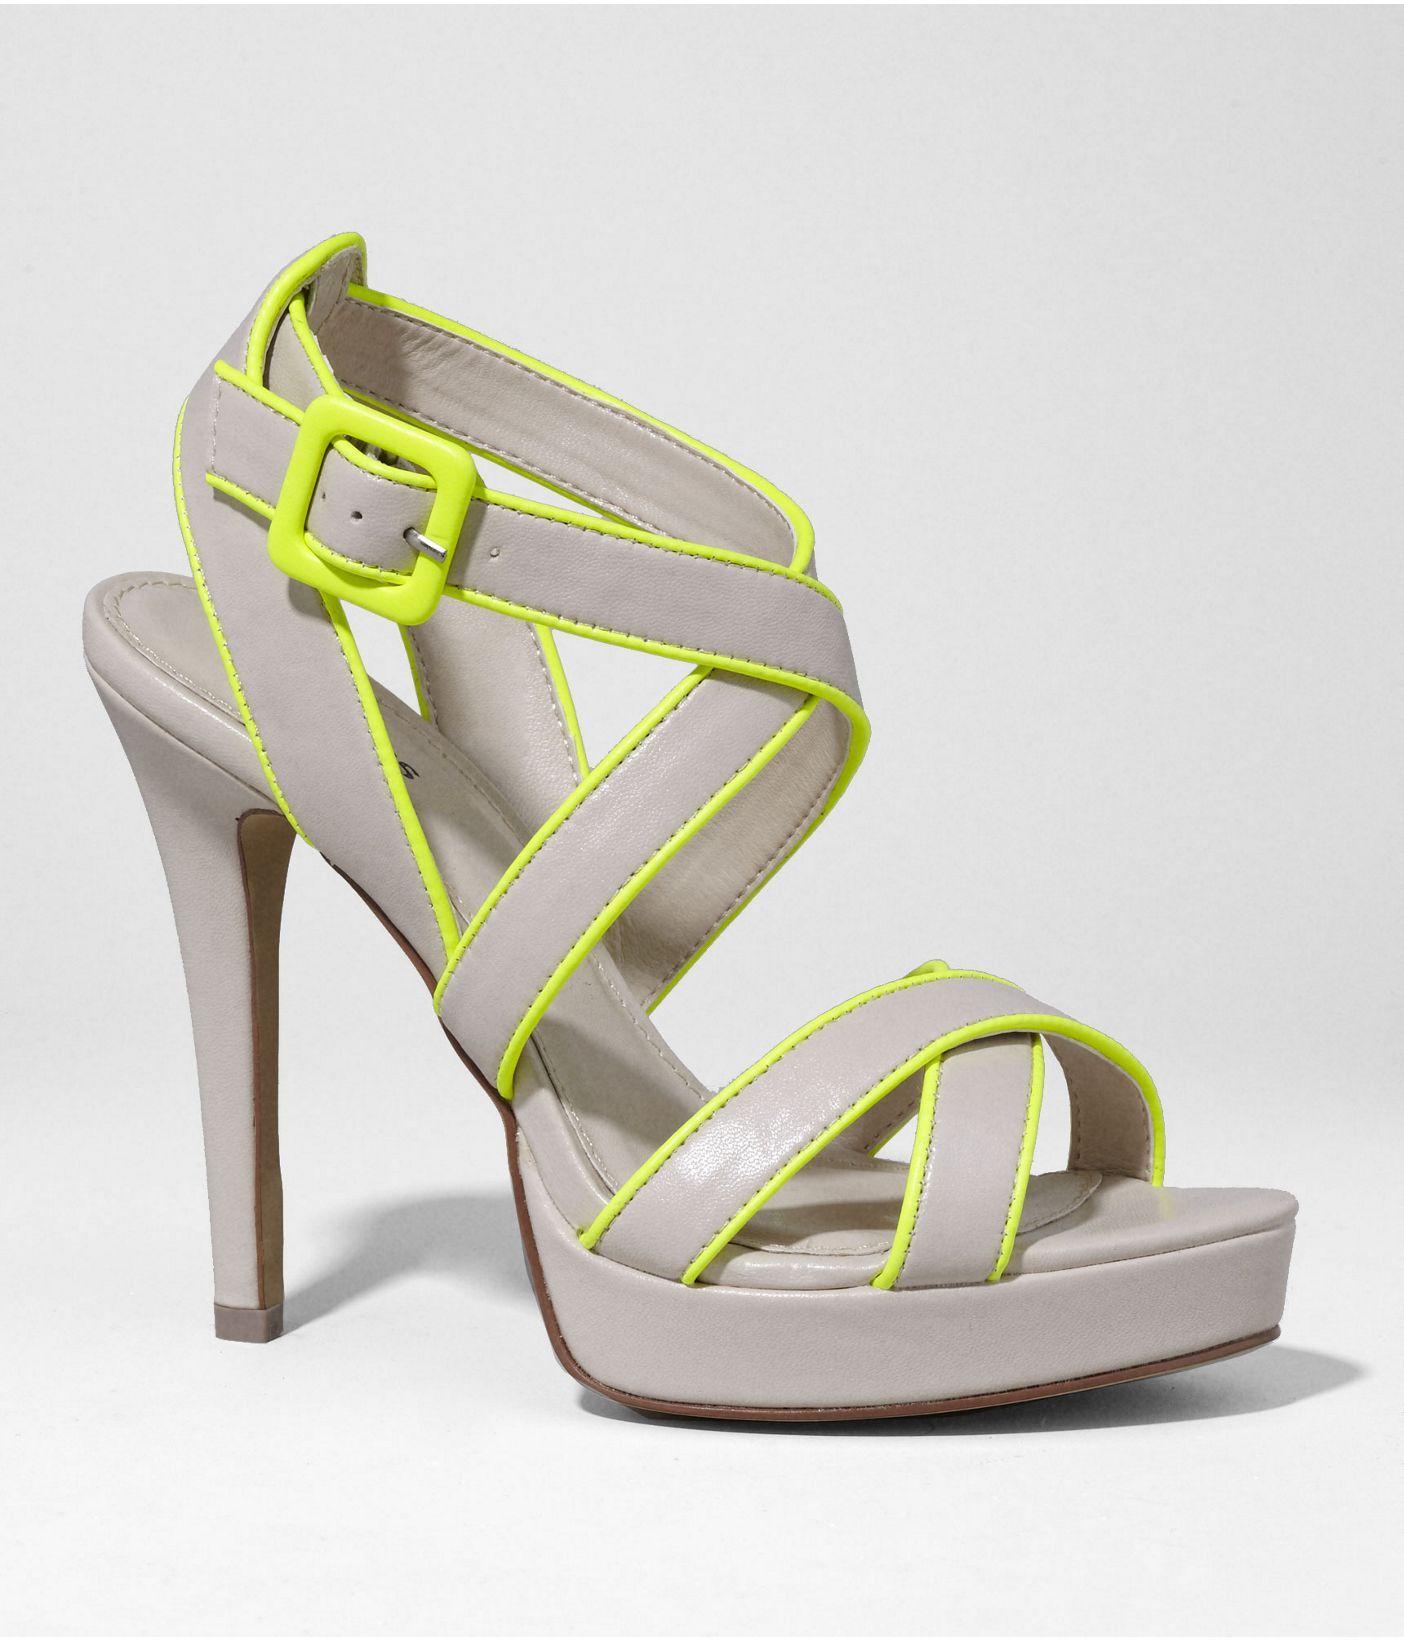 86612fdc4df NEON EDGED MULTI-STRAP PLATFORM SANDALS | Express | Fashion ...